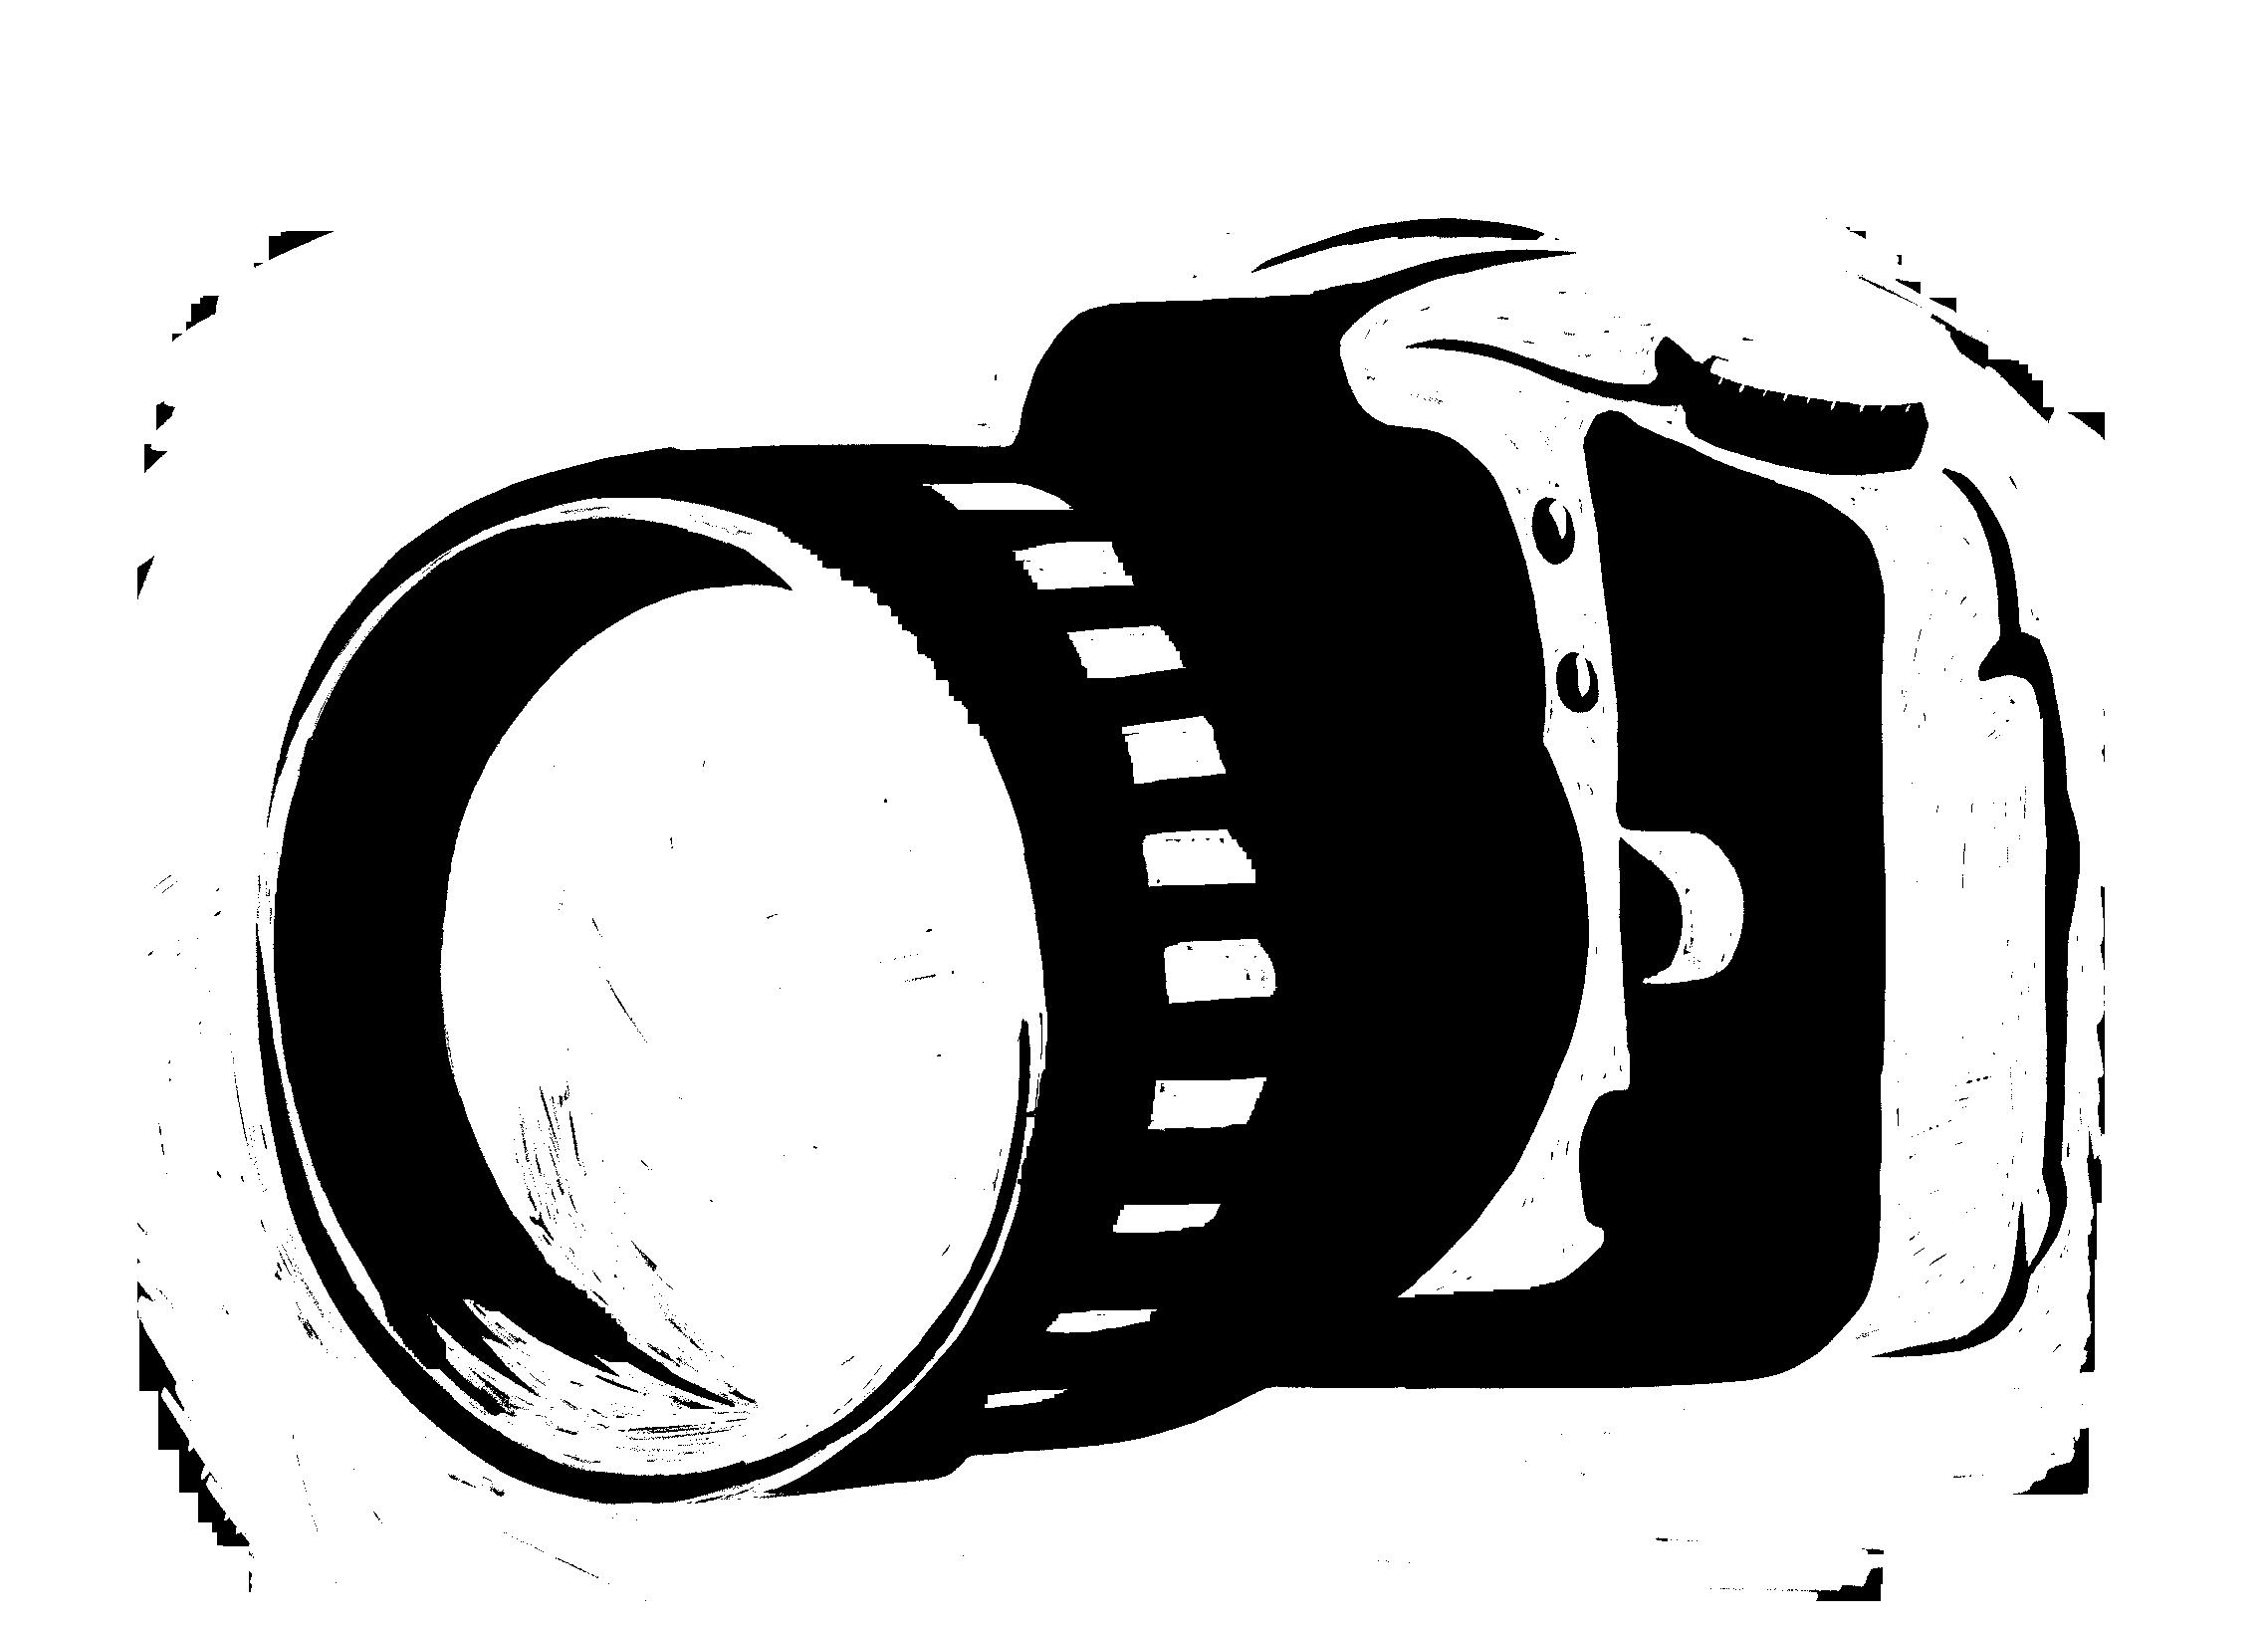 freeuse library Photography clipart camera logo